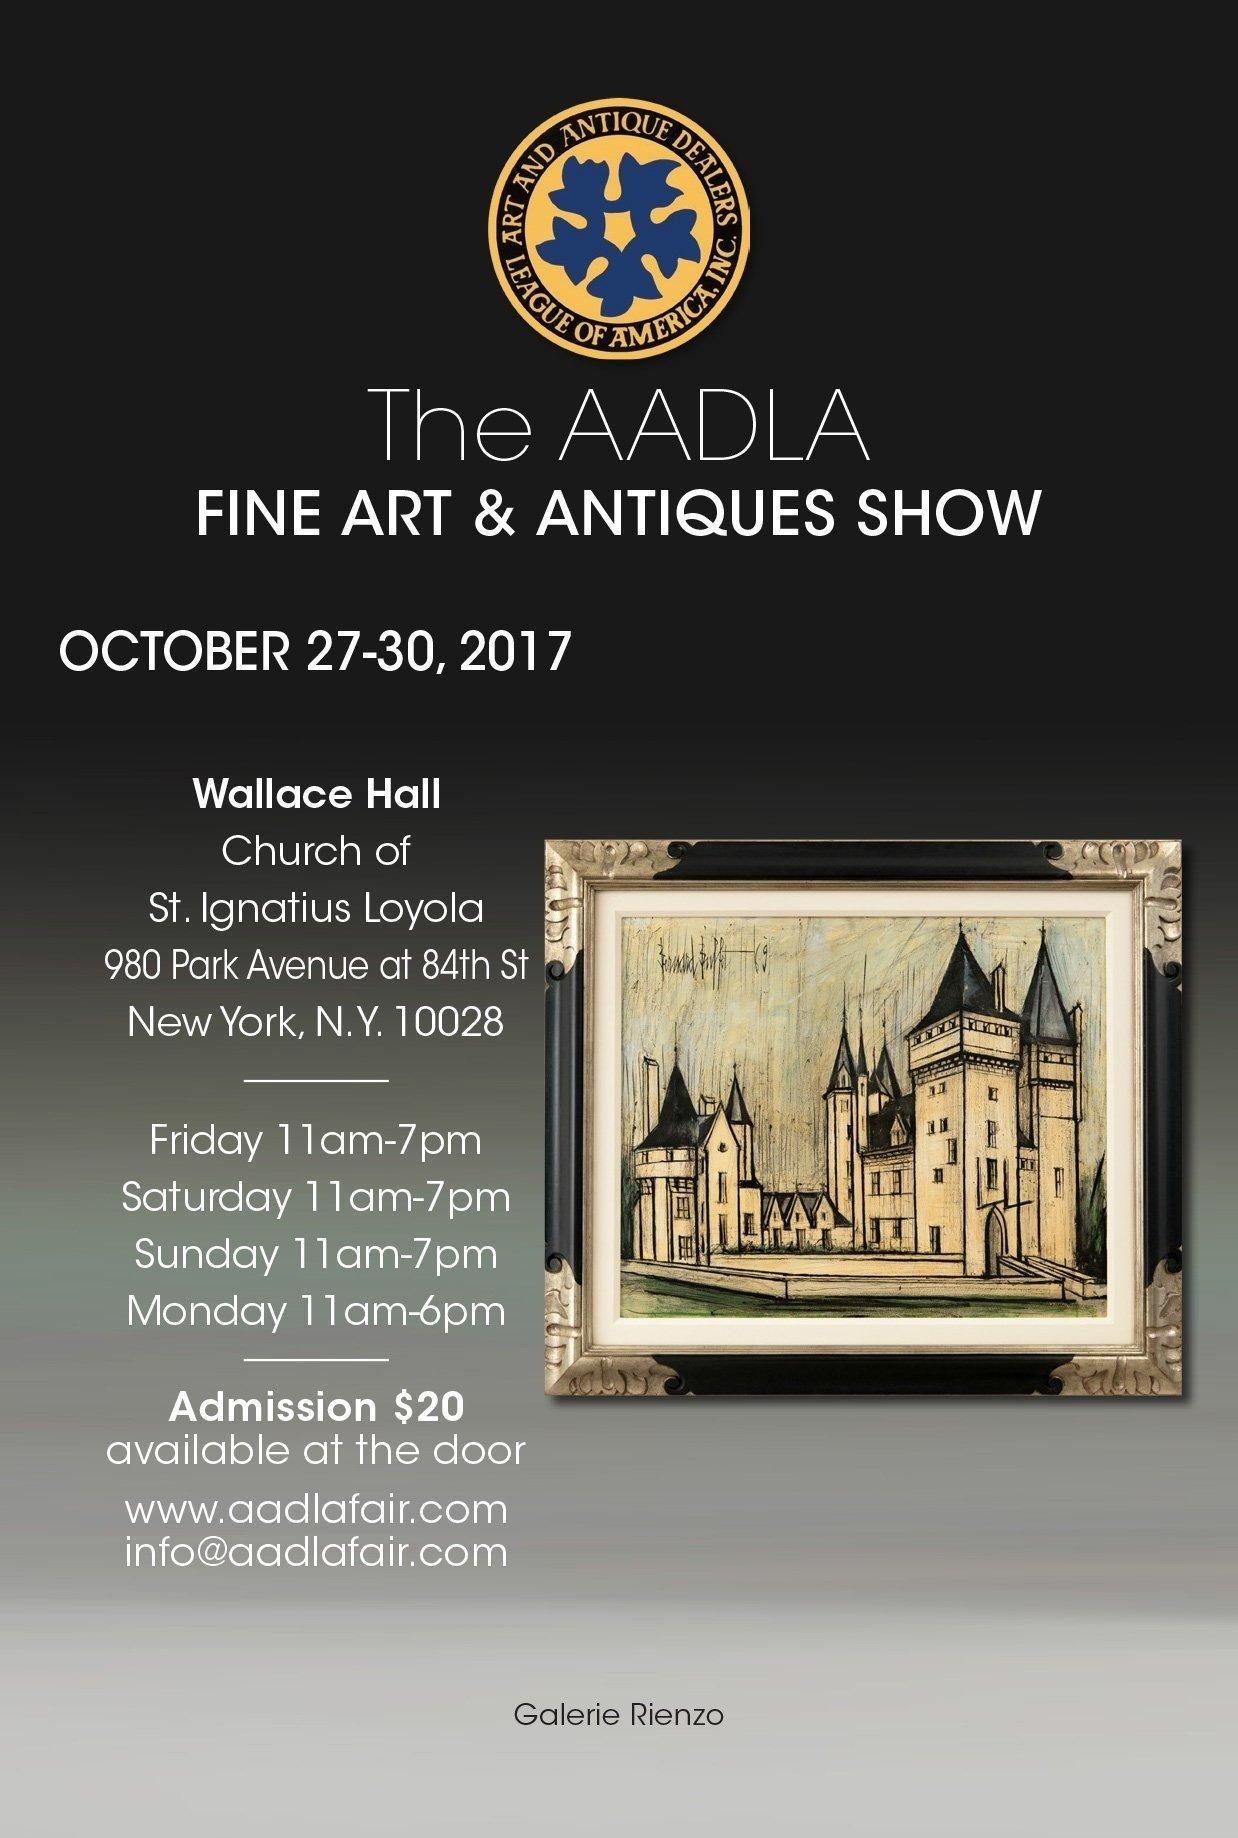 The AADLA Fine Art & Antiques Show flyer